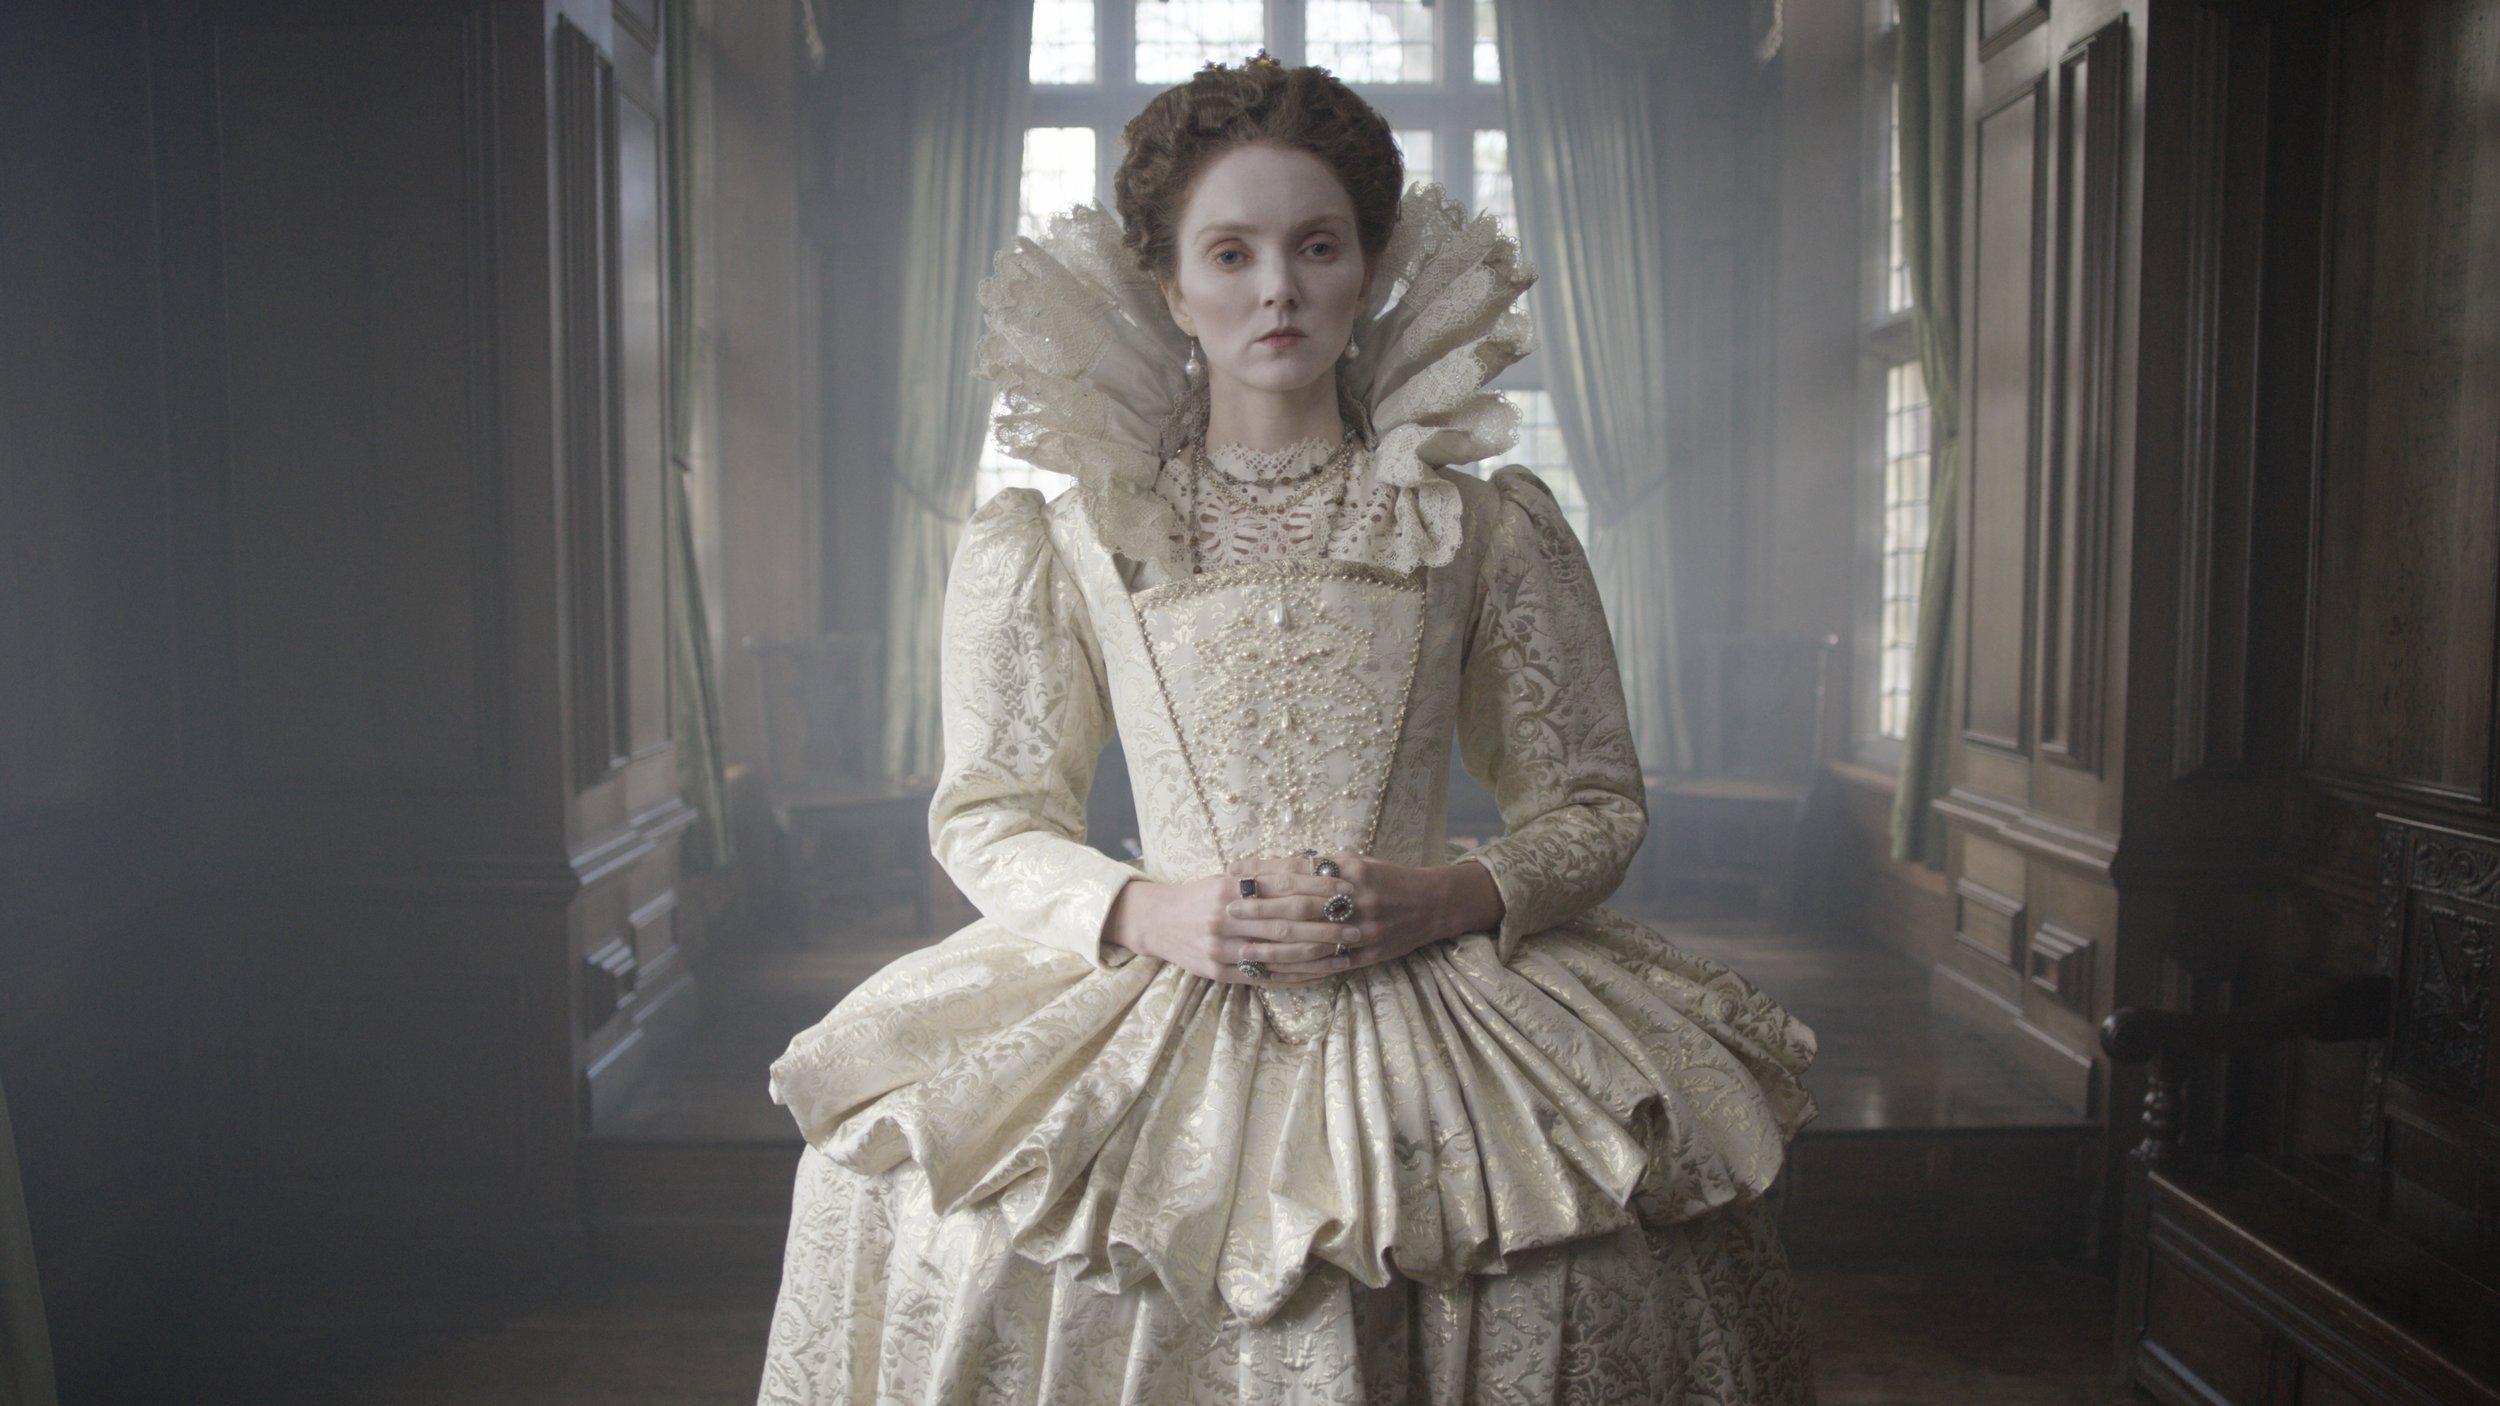 Brendan McGinty Cinematography, Lily Cole, Elizabeth I